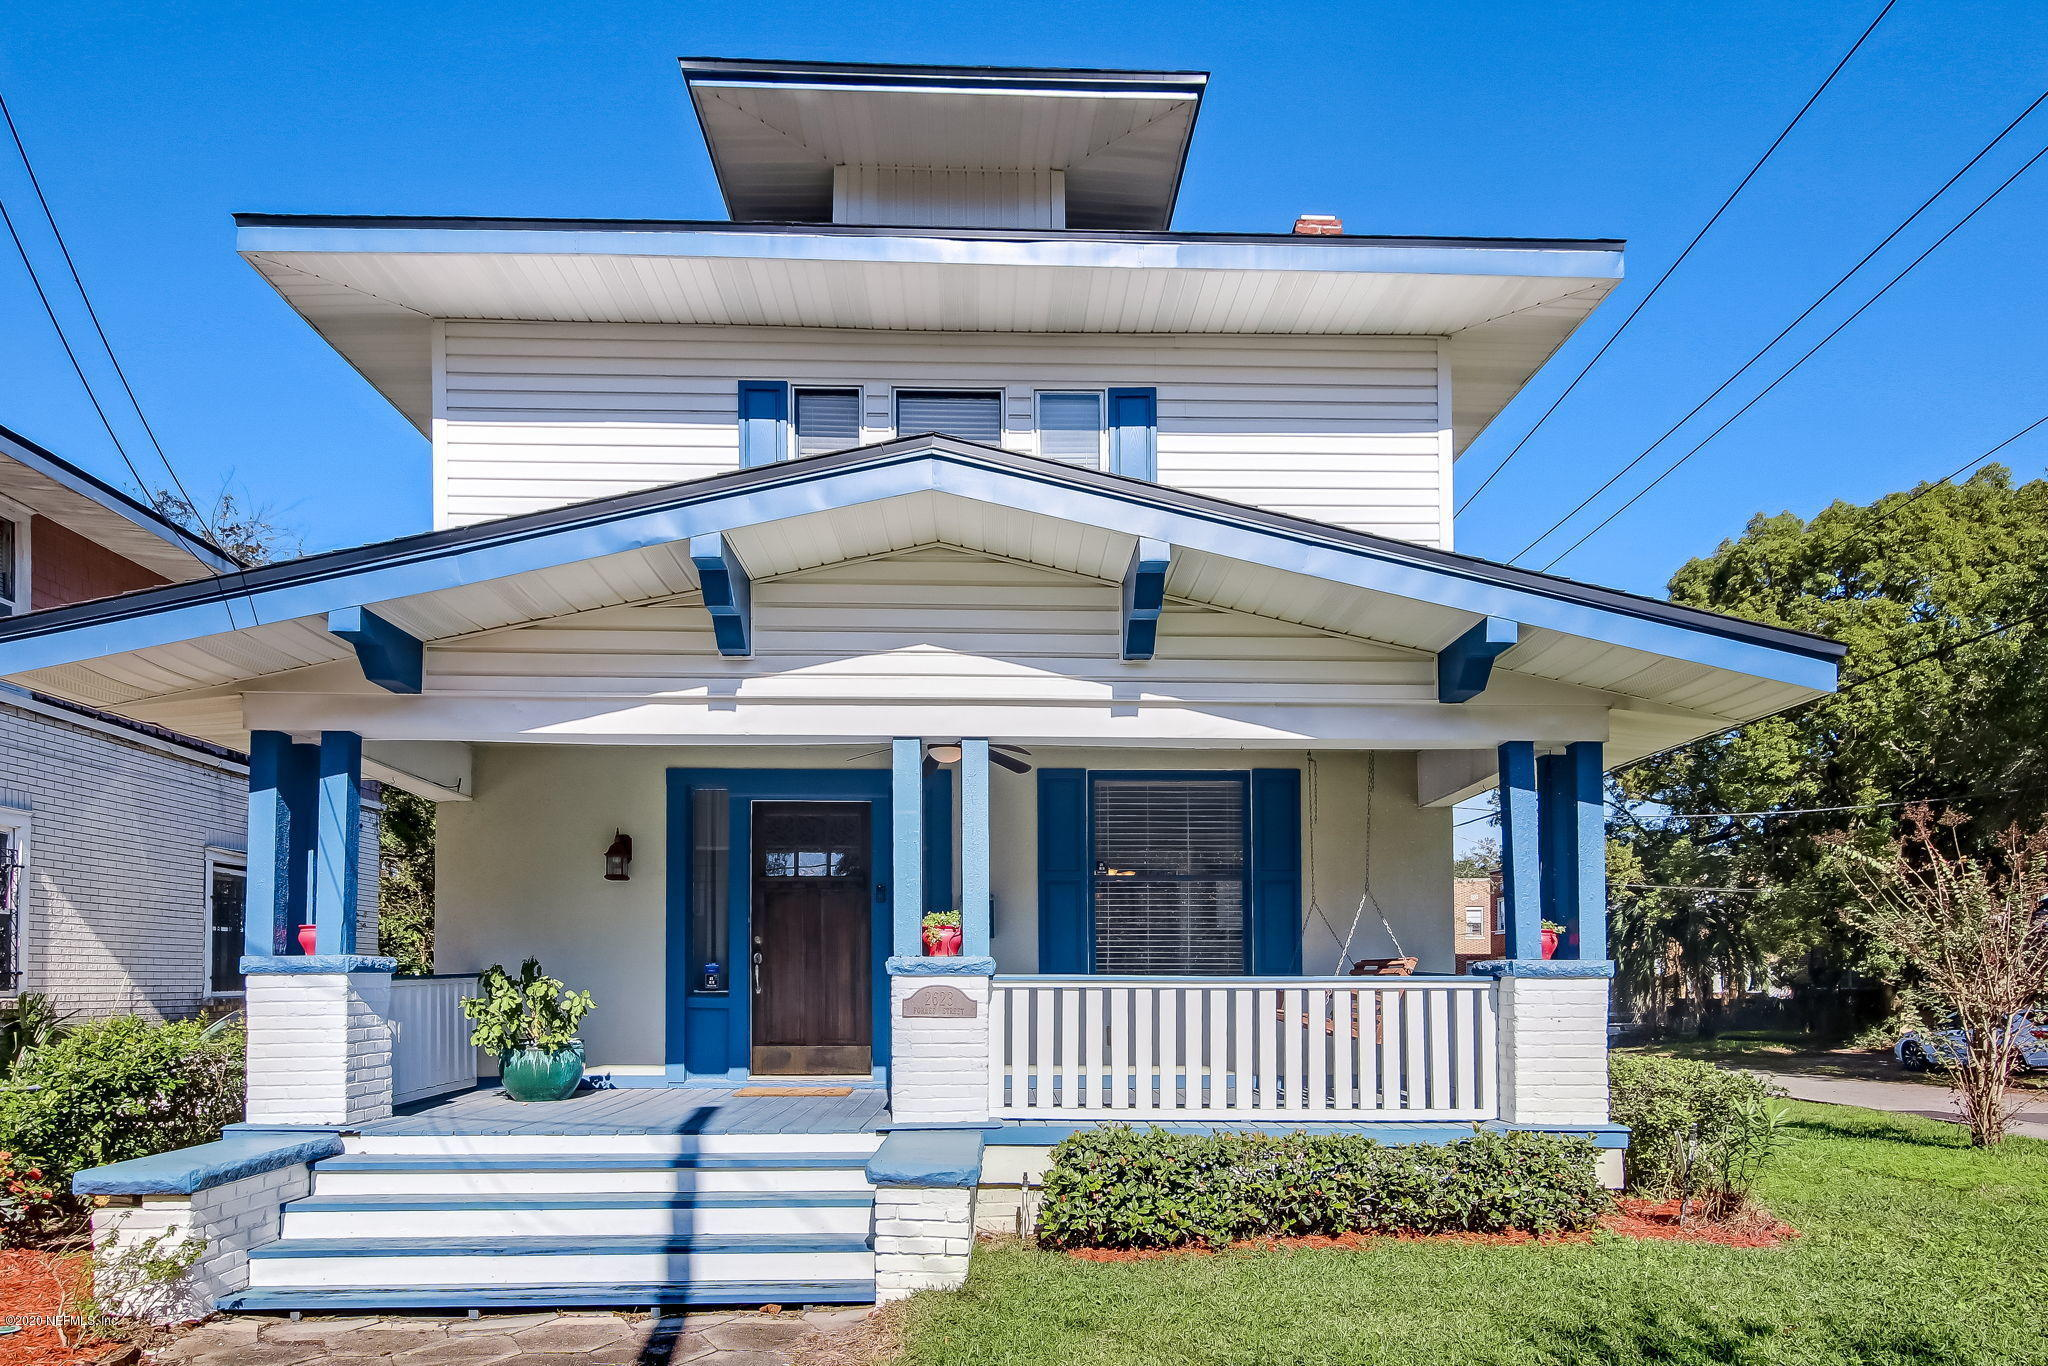 2623 Forbes St Jacksonville, Fl 32204